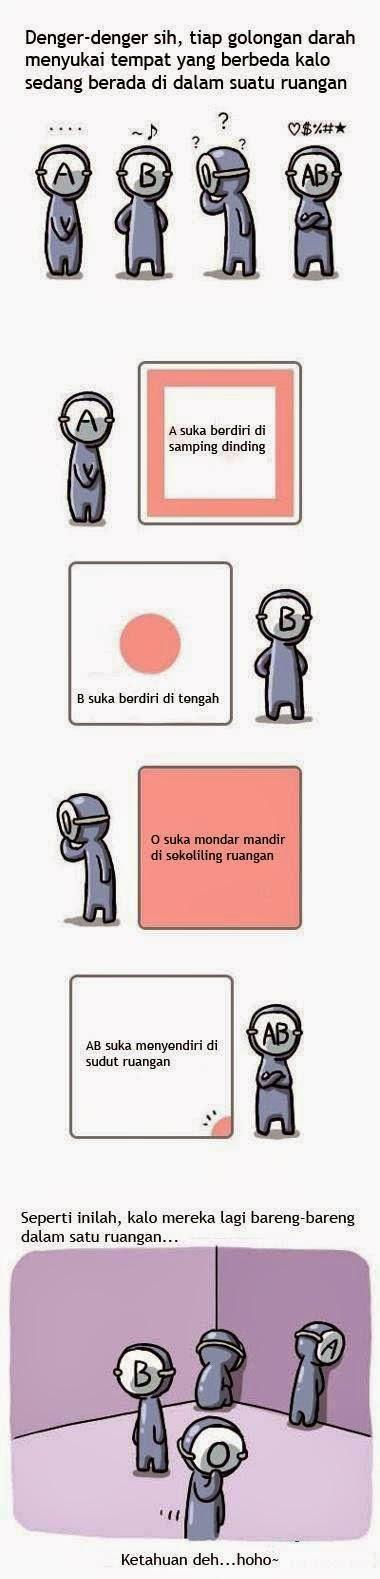 Komik lucu tentang Golongan Darah